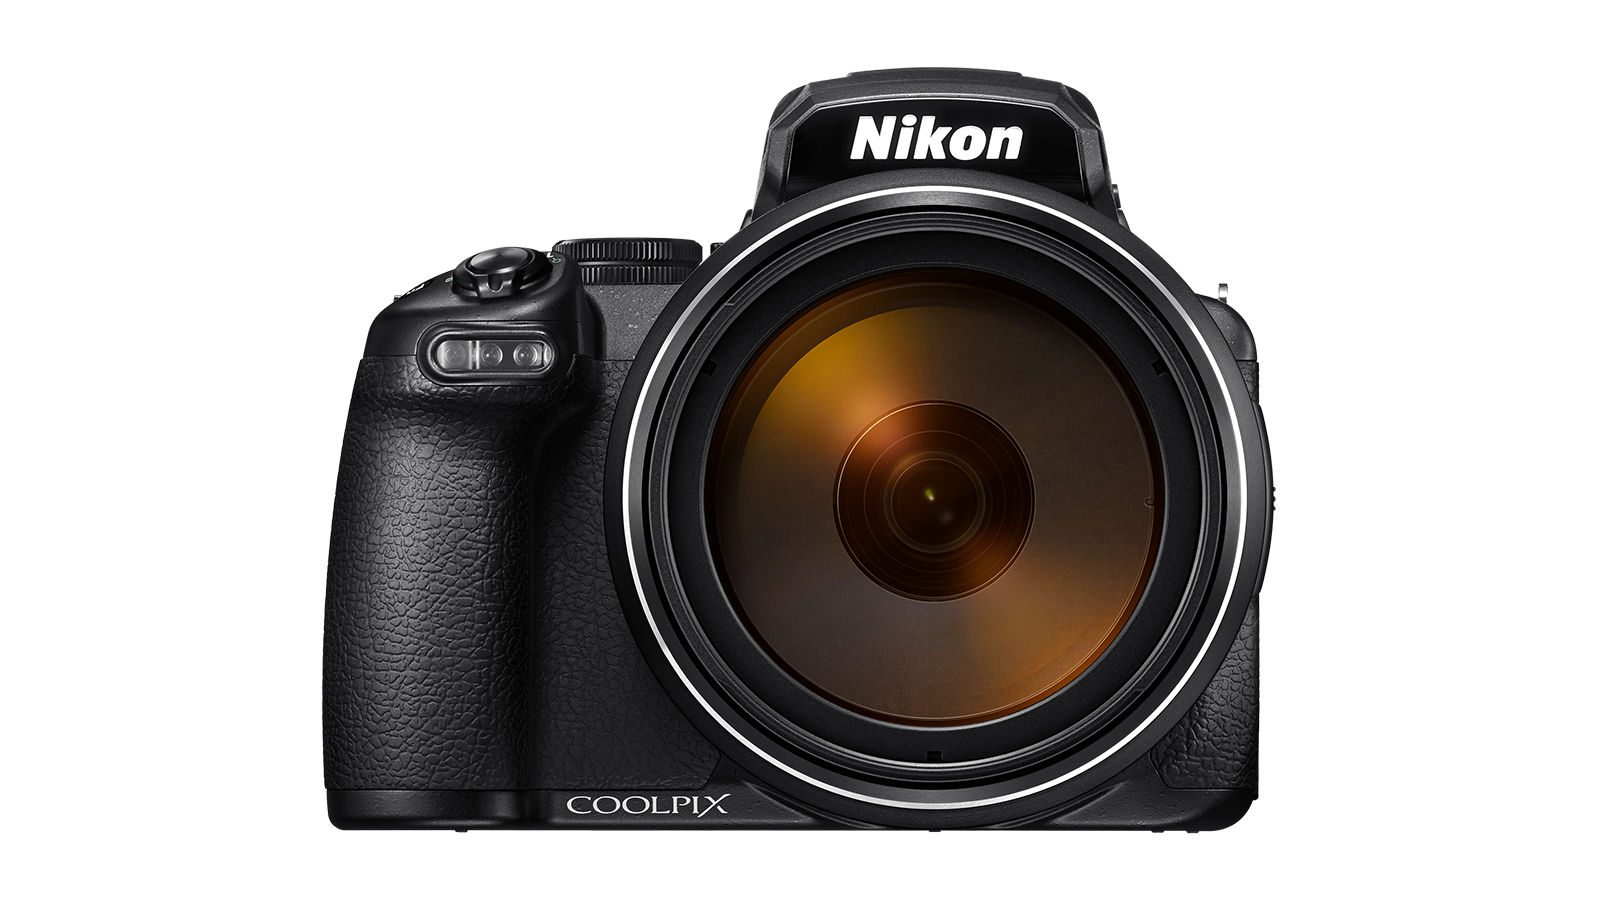 Nikon's P1000 Features a 125x Optical Zoom